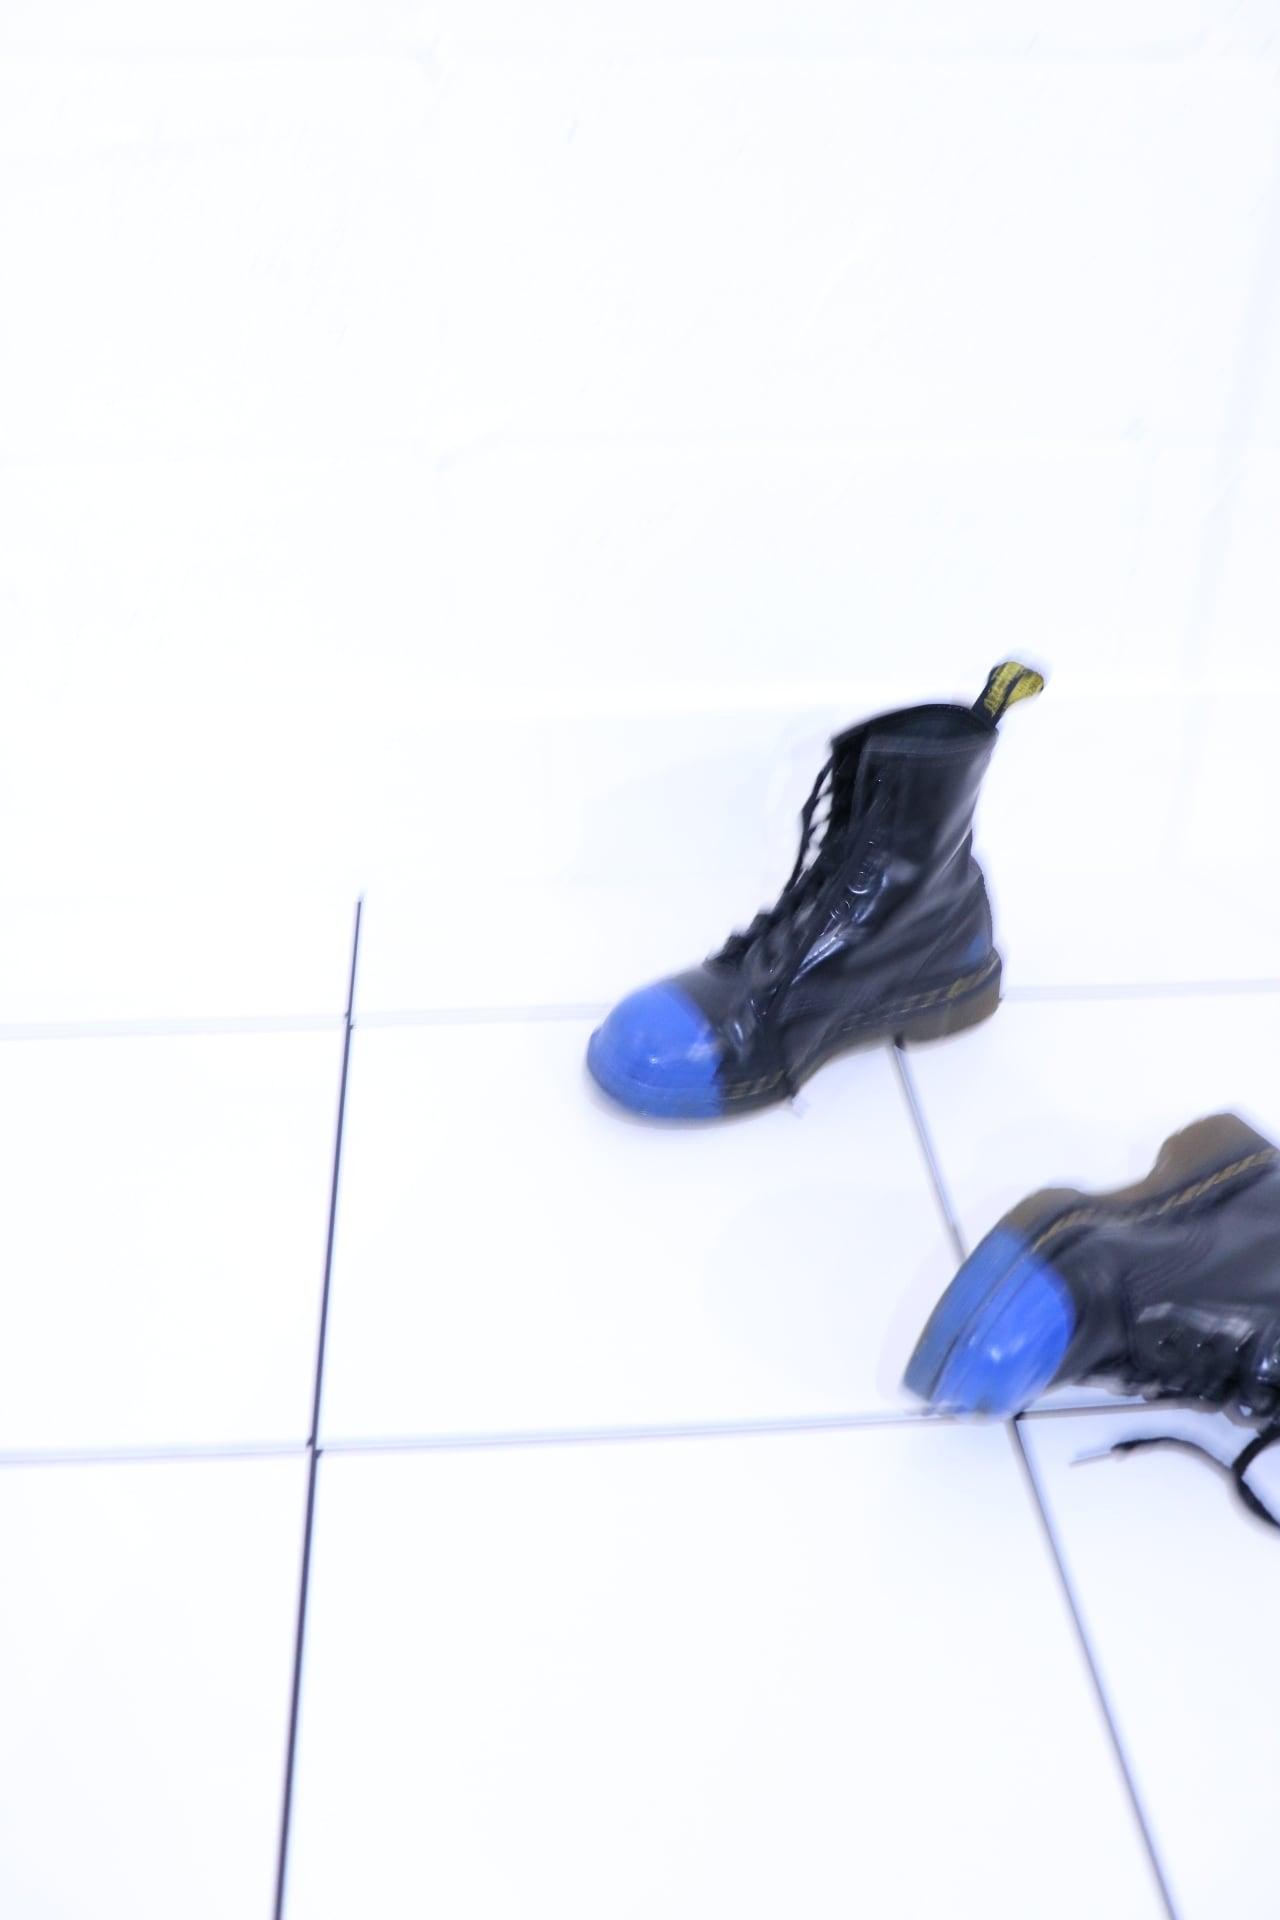 Vintage Dr.Martens painted 8 hole boots